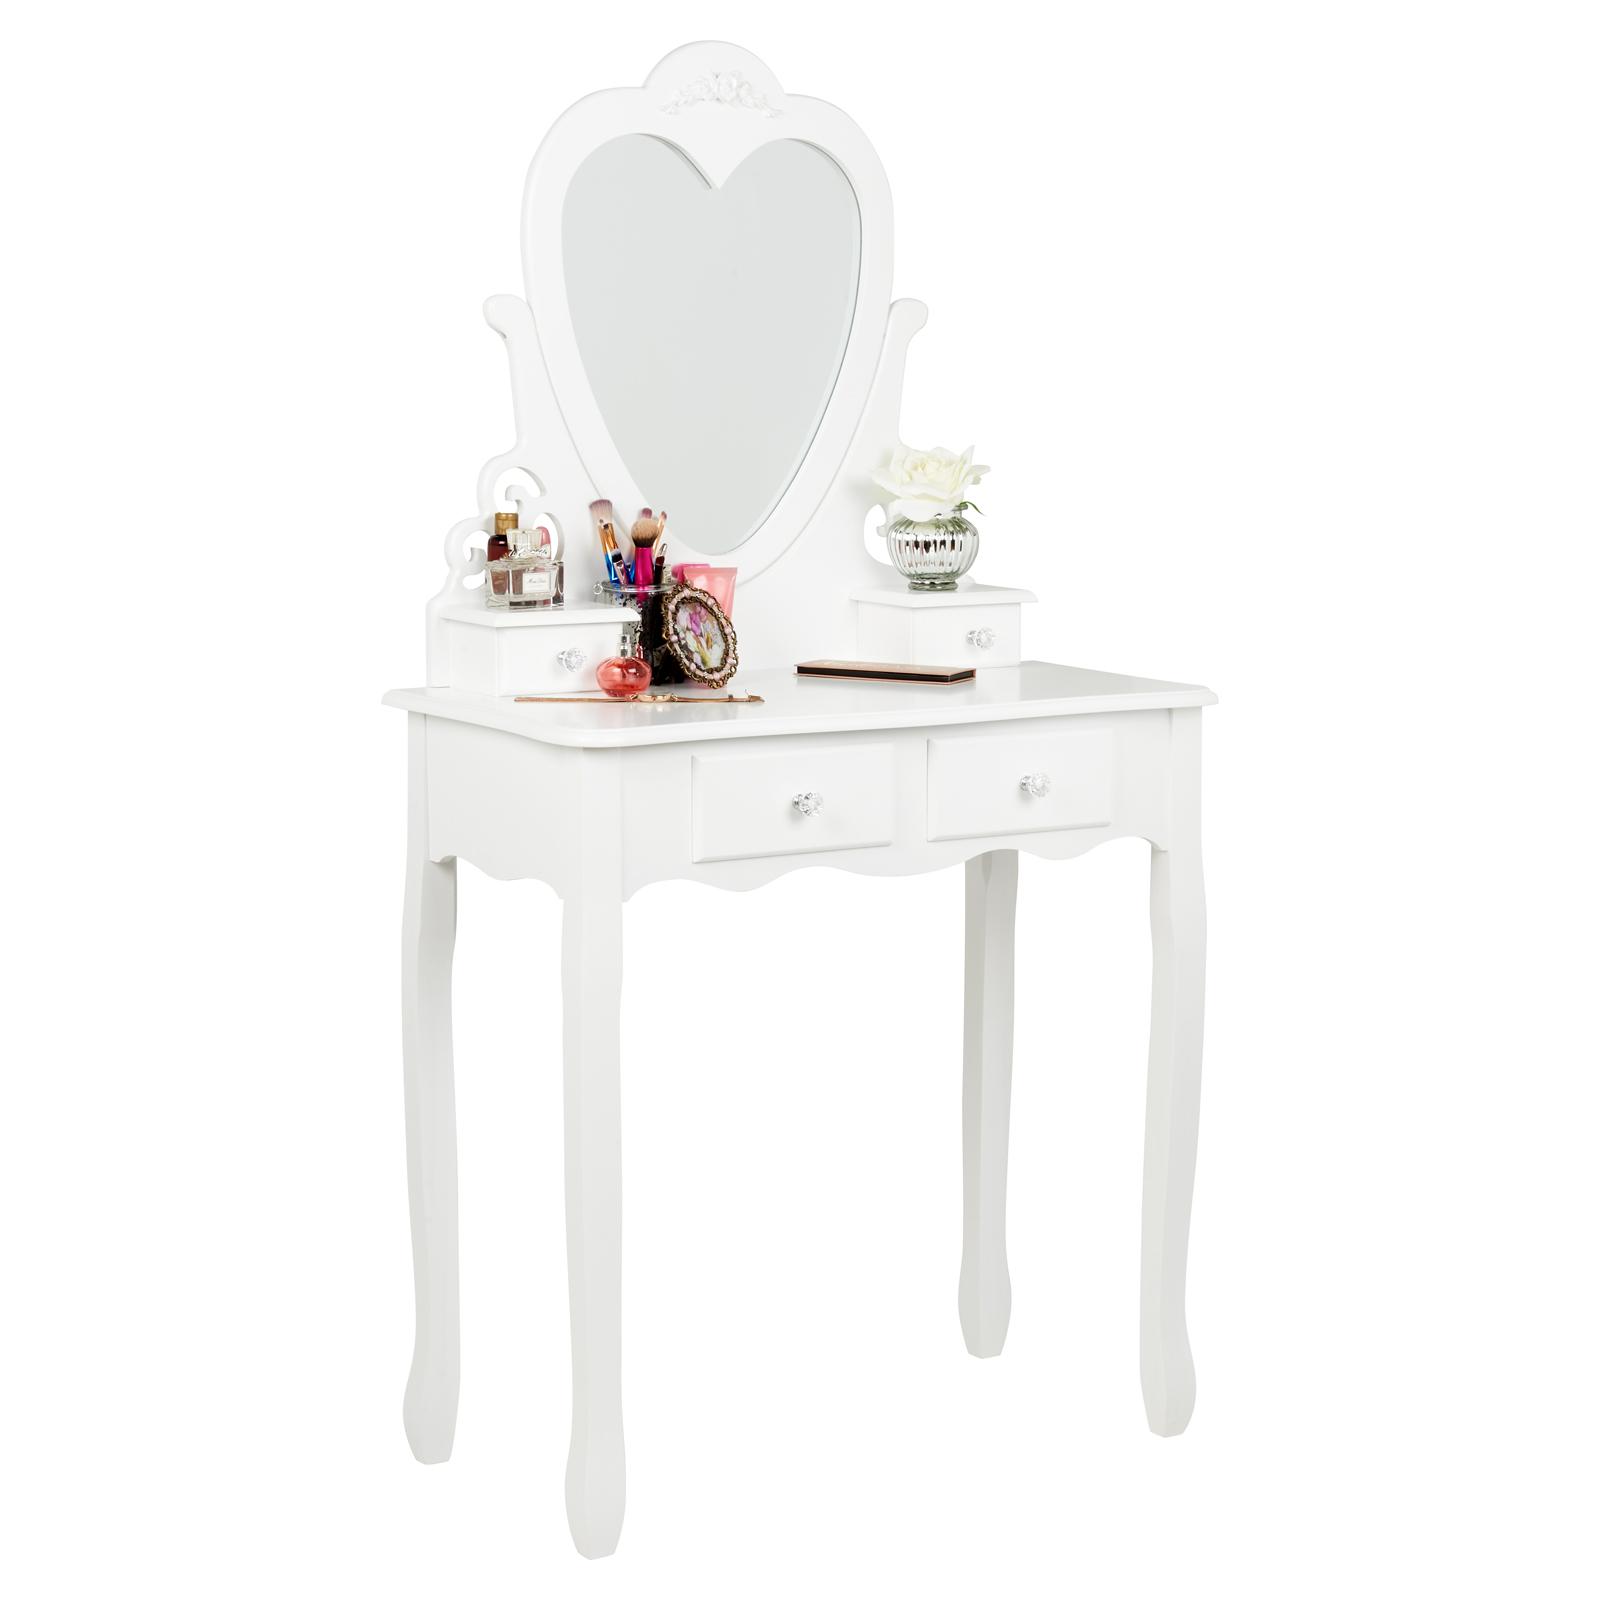 Details About Hartleys White 4 Drawer Dressing Table Heart Mirror Bedroom Makeup Vanity Desk